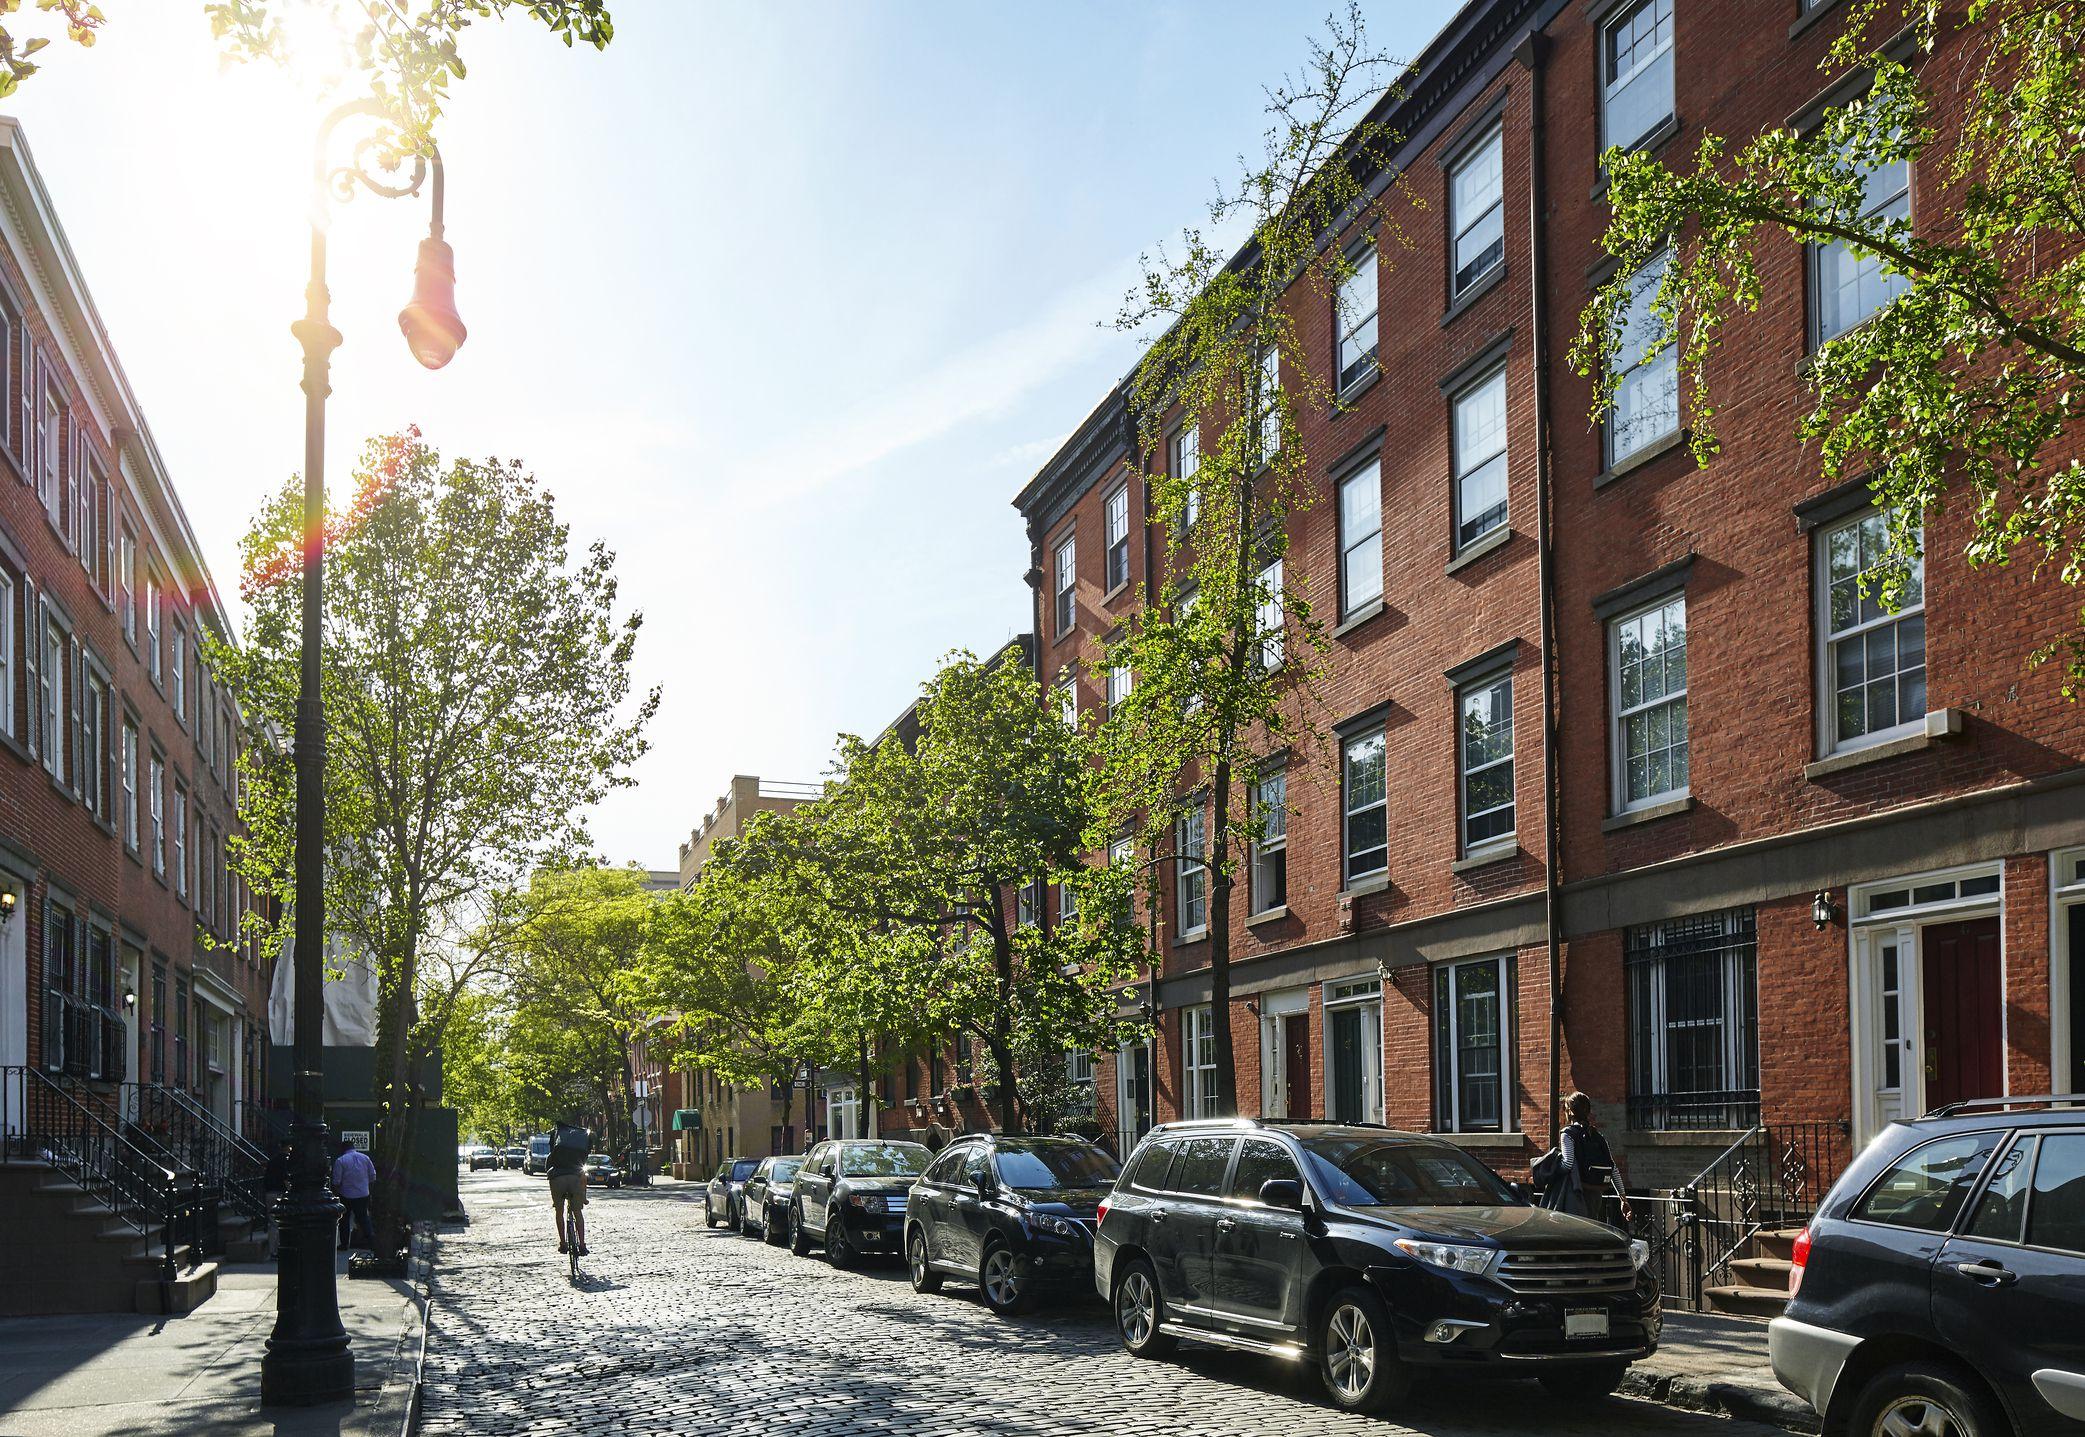 The 33 Top New York City Neighborhoods to Explore